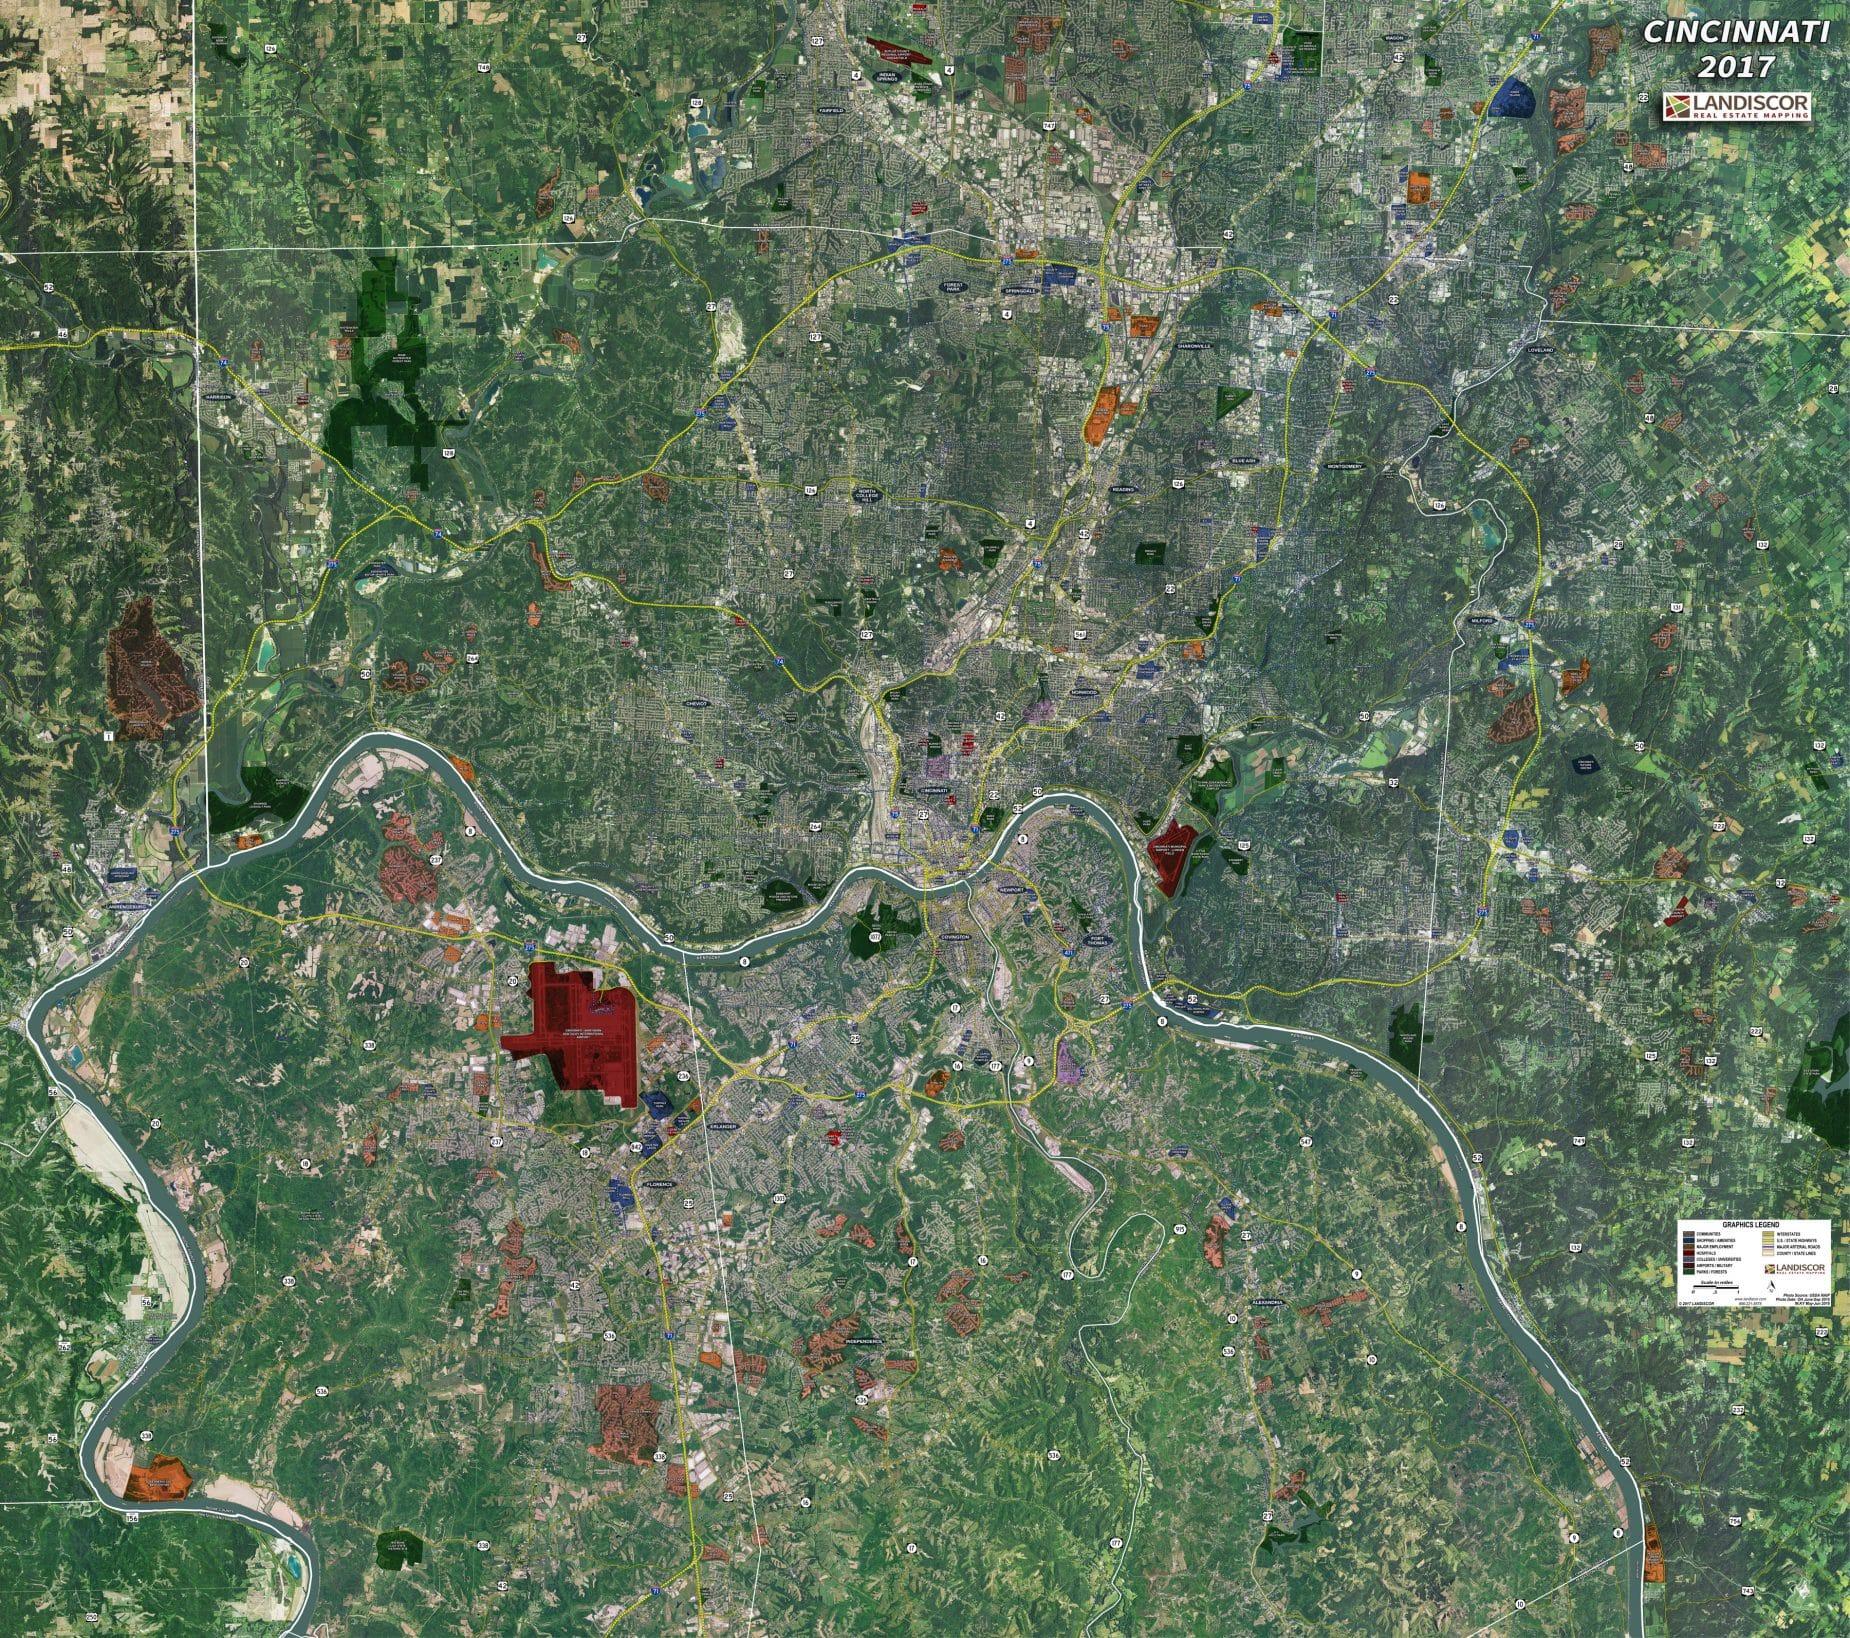 Cincinnati - Rolled Aerial Map - Landiscor Real Estate Mapping